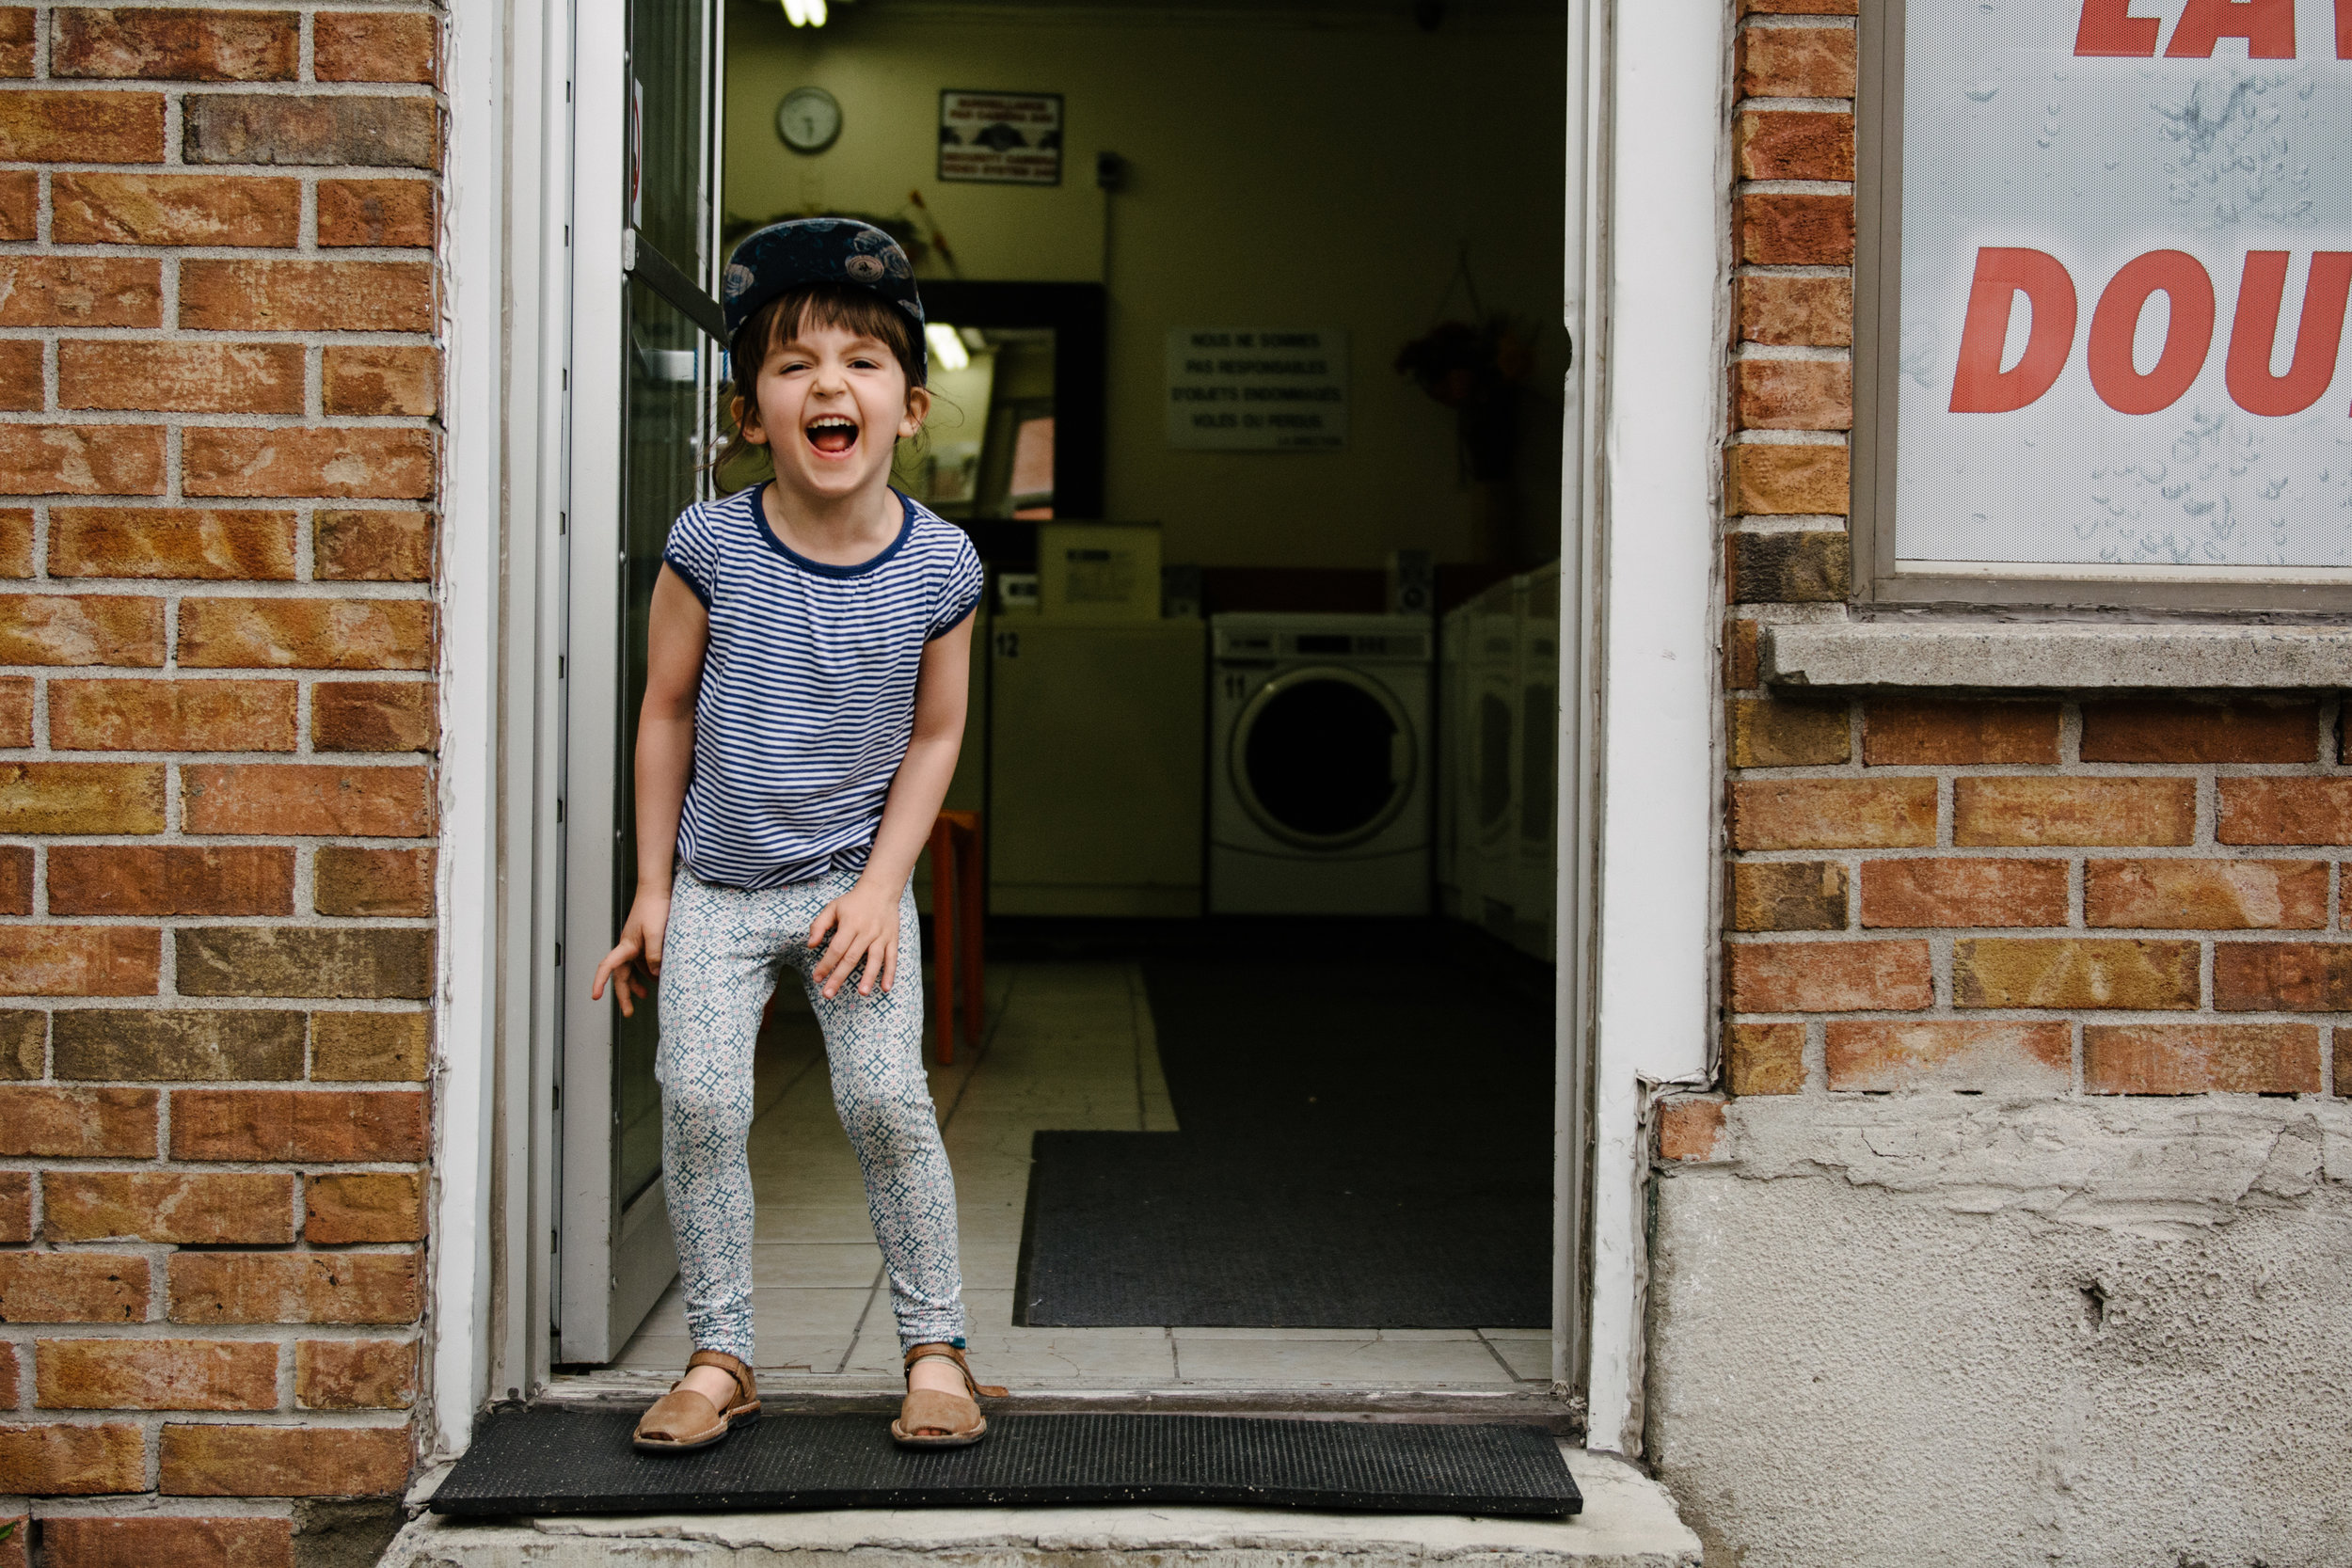 ete_photographe-famille-lifestyle-montreal-2.jpg